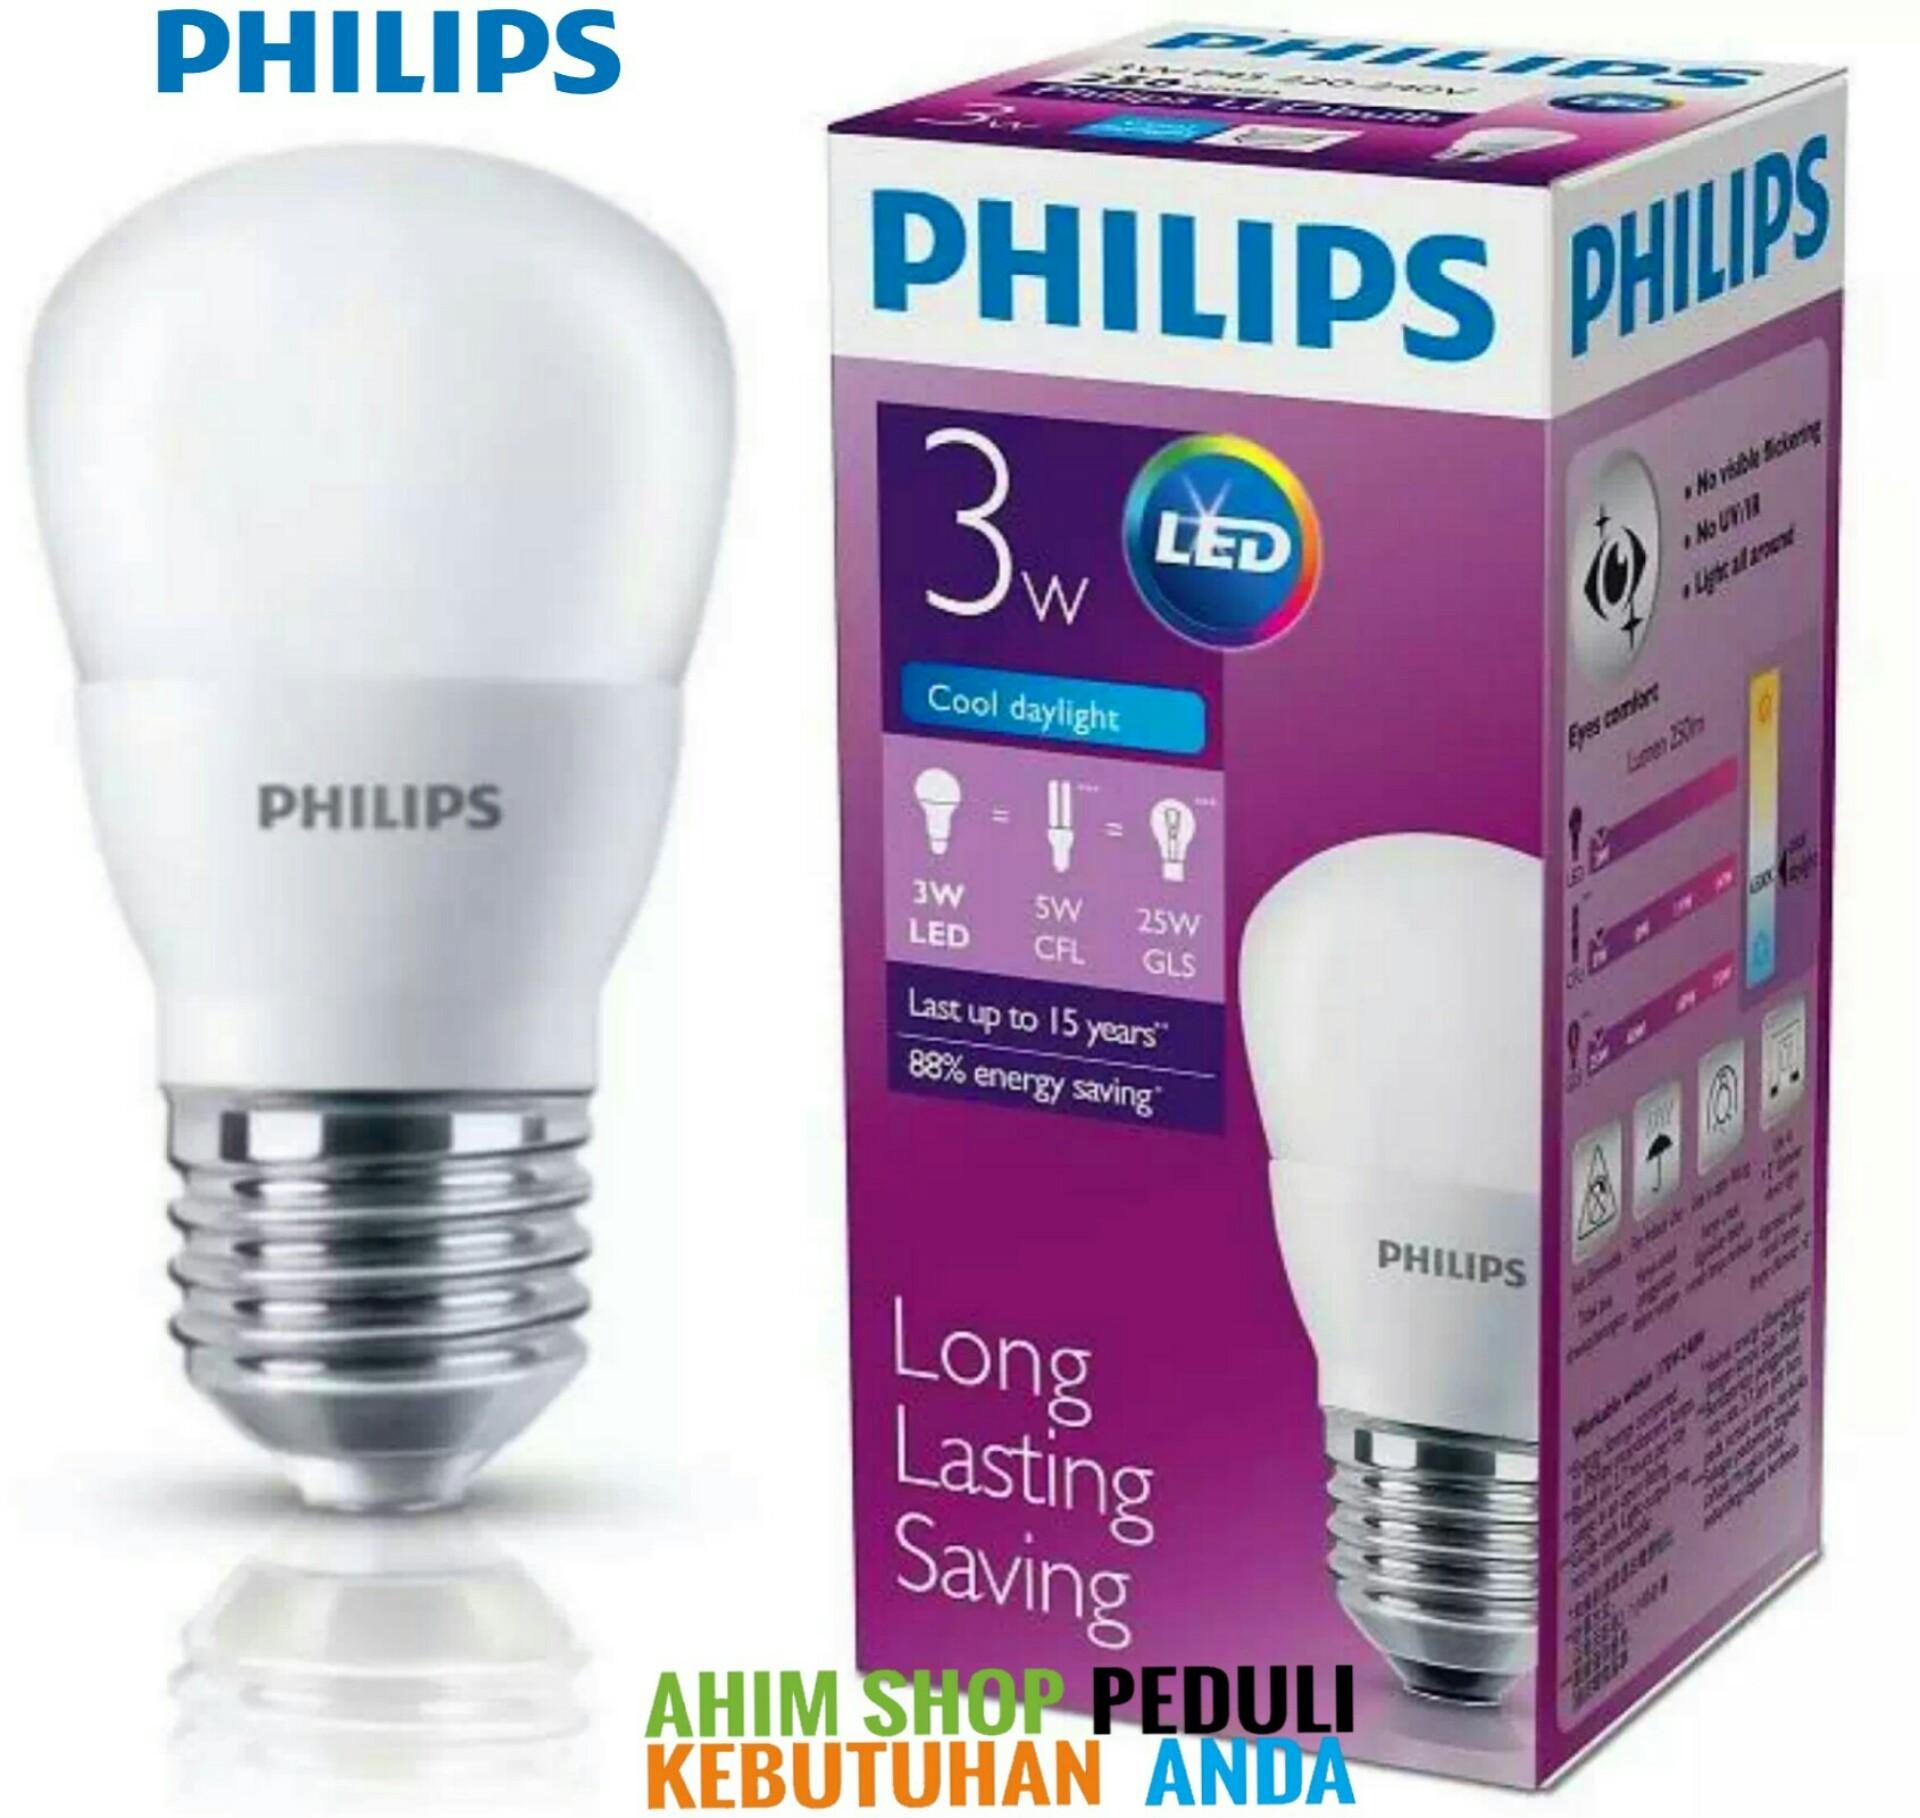 PHILIPS Lampu Led Bulb 3 Watt 3W 3Wat 3 W Putih Paket 4 Pcs - Cool